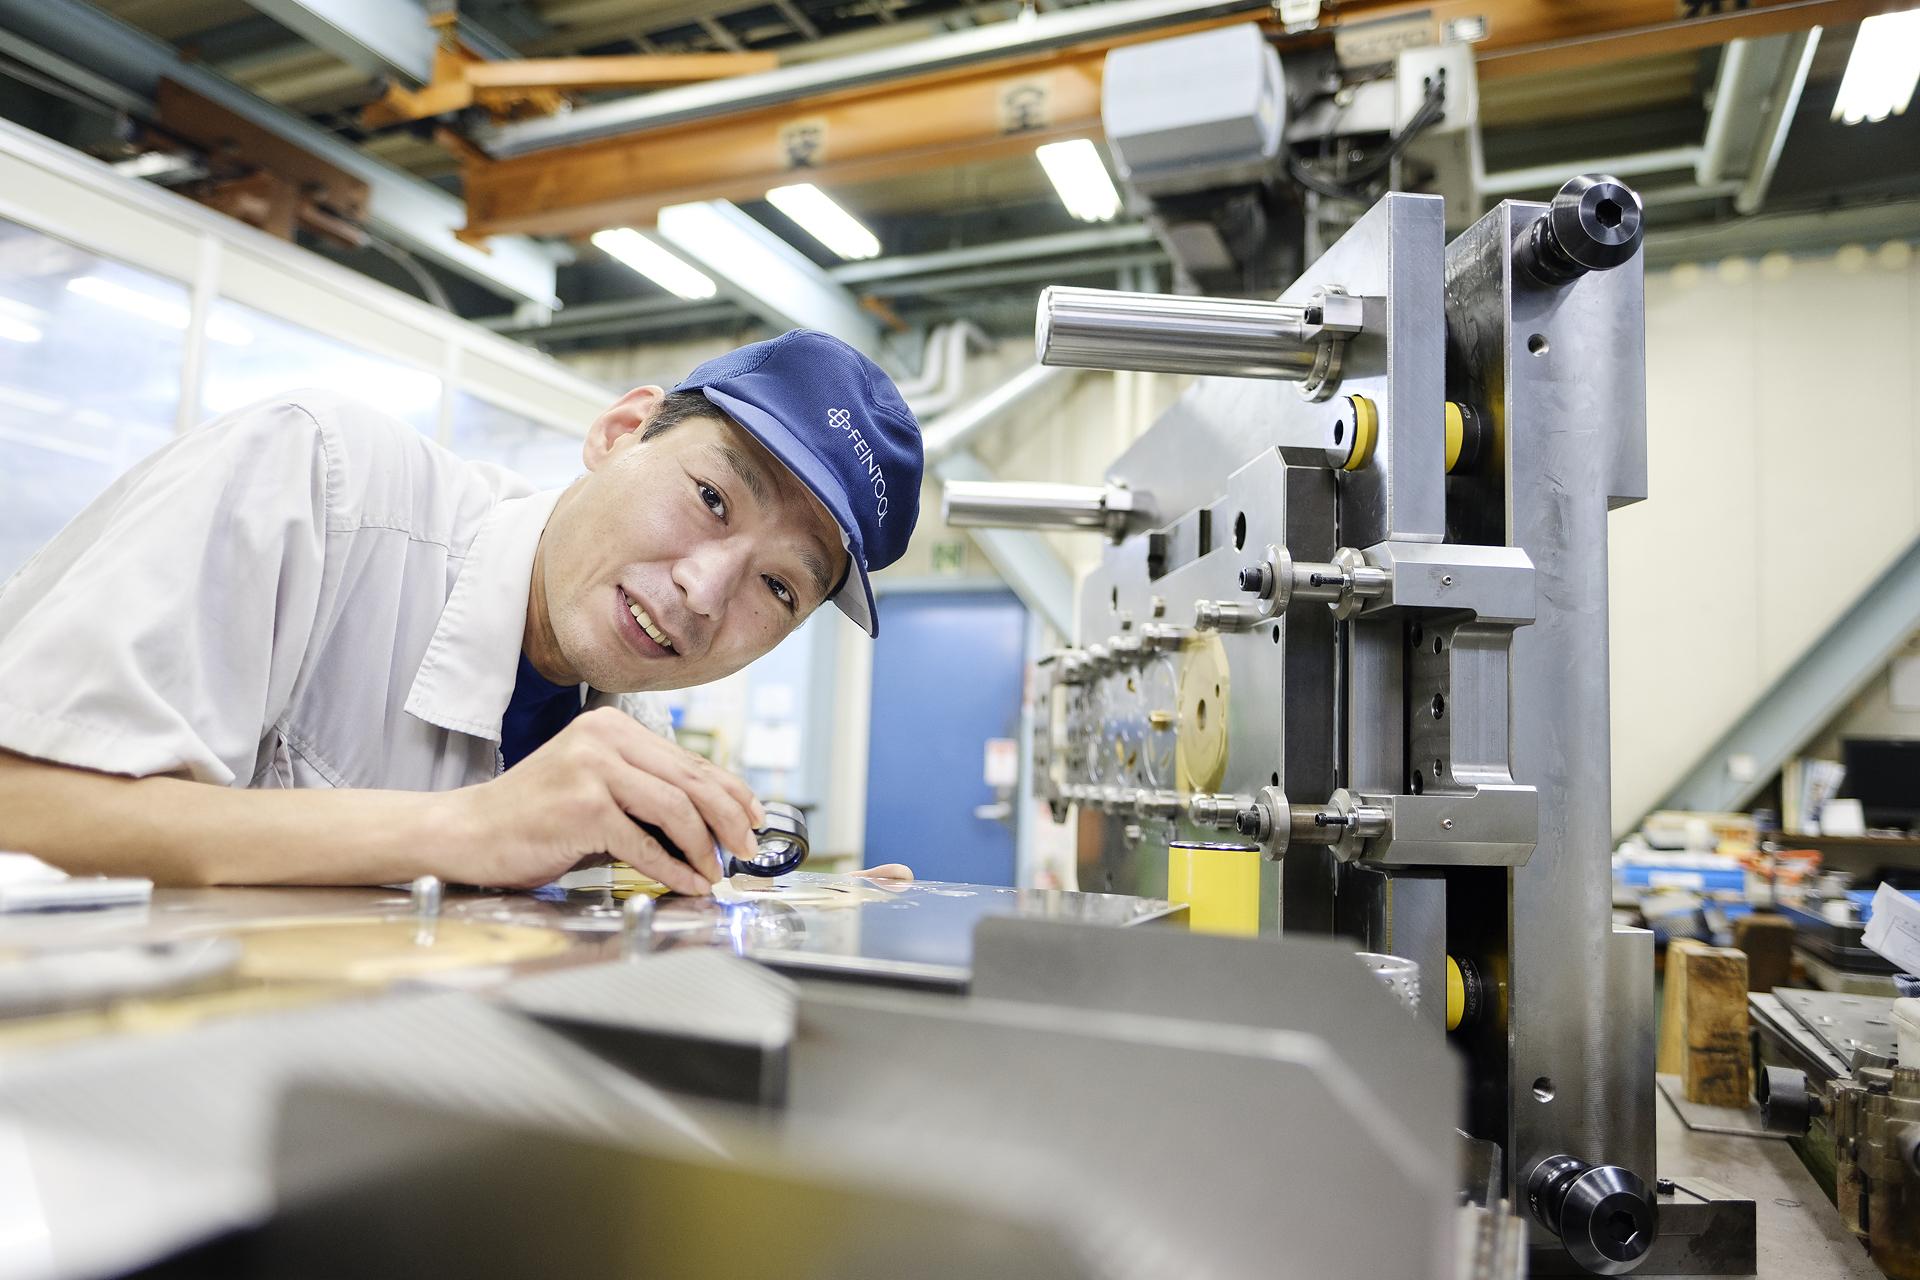 180917-Atsugi-plant-6244-1